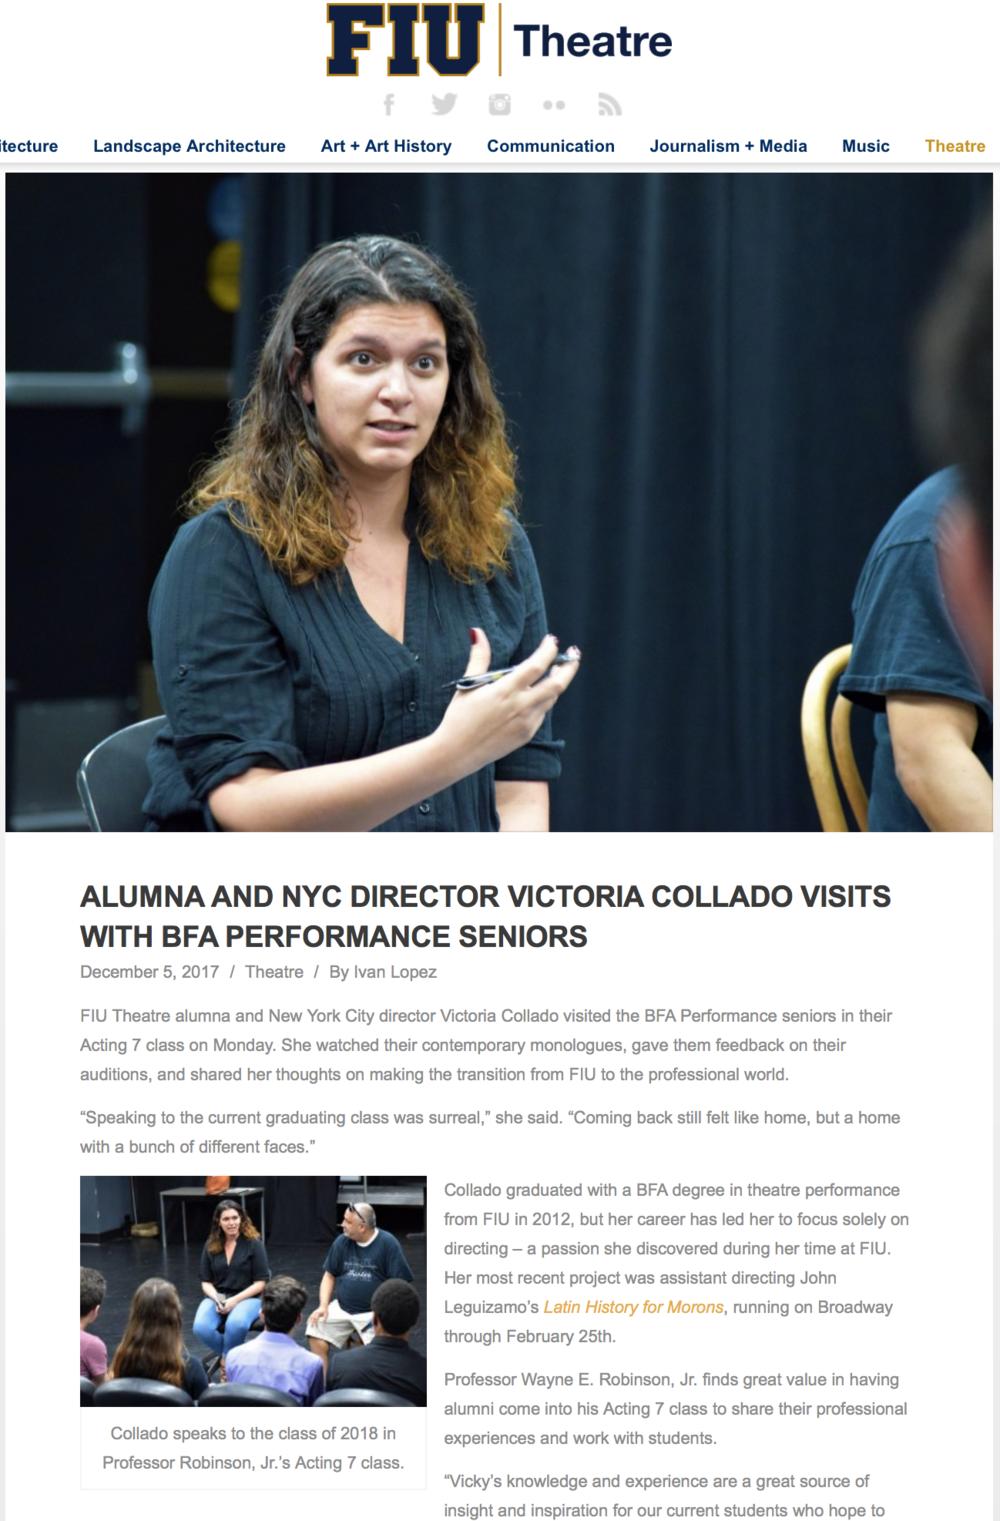 alumna director visits bfa students - florida international university